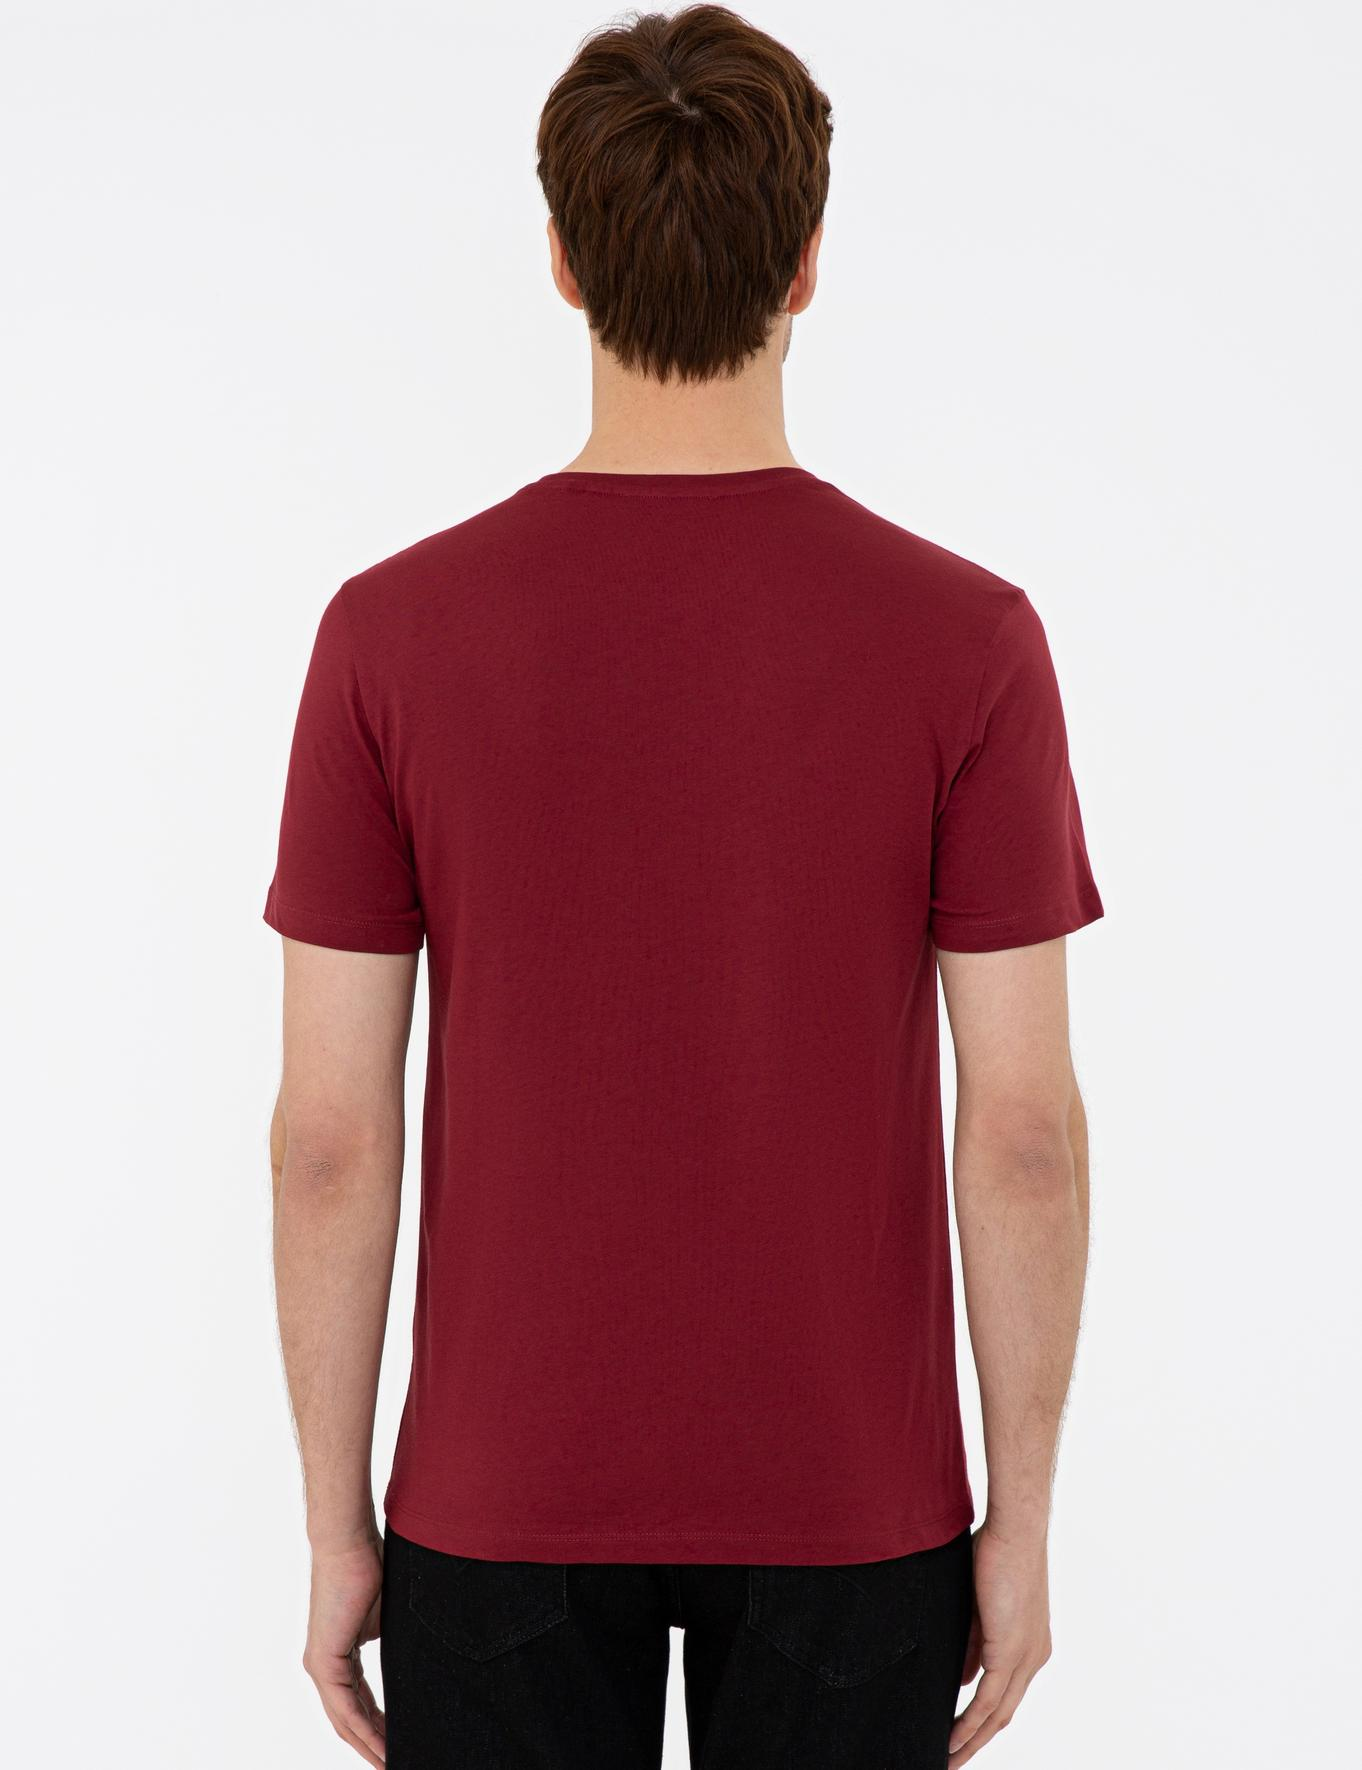 Bisiklet Yaka Basic T-Shirt - 50239832011